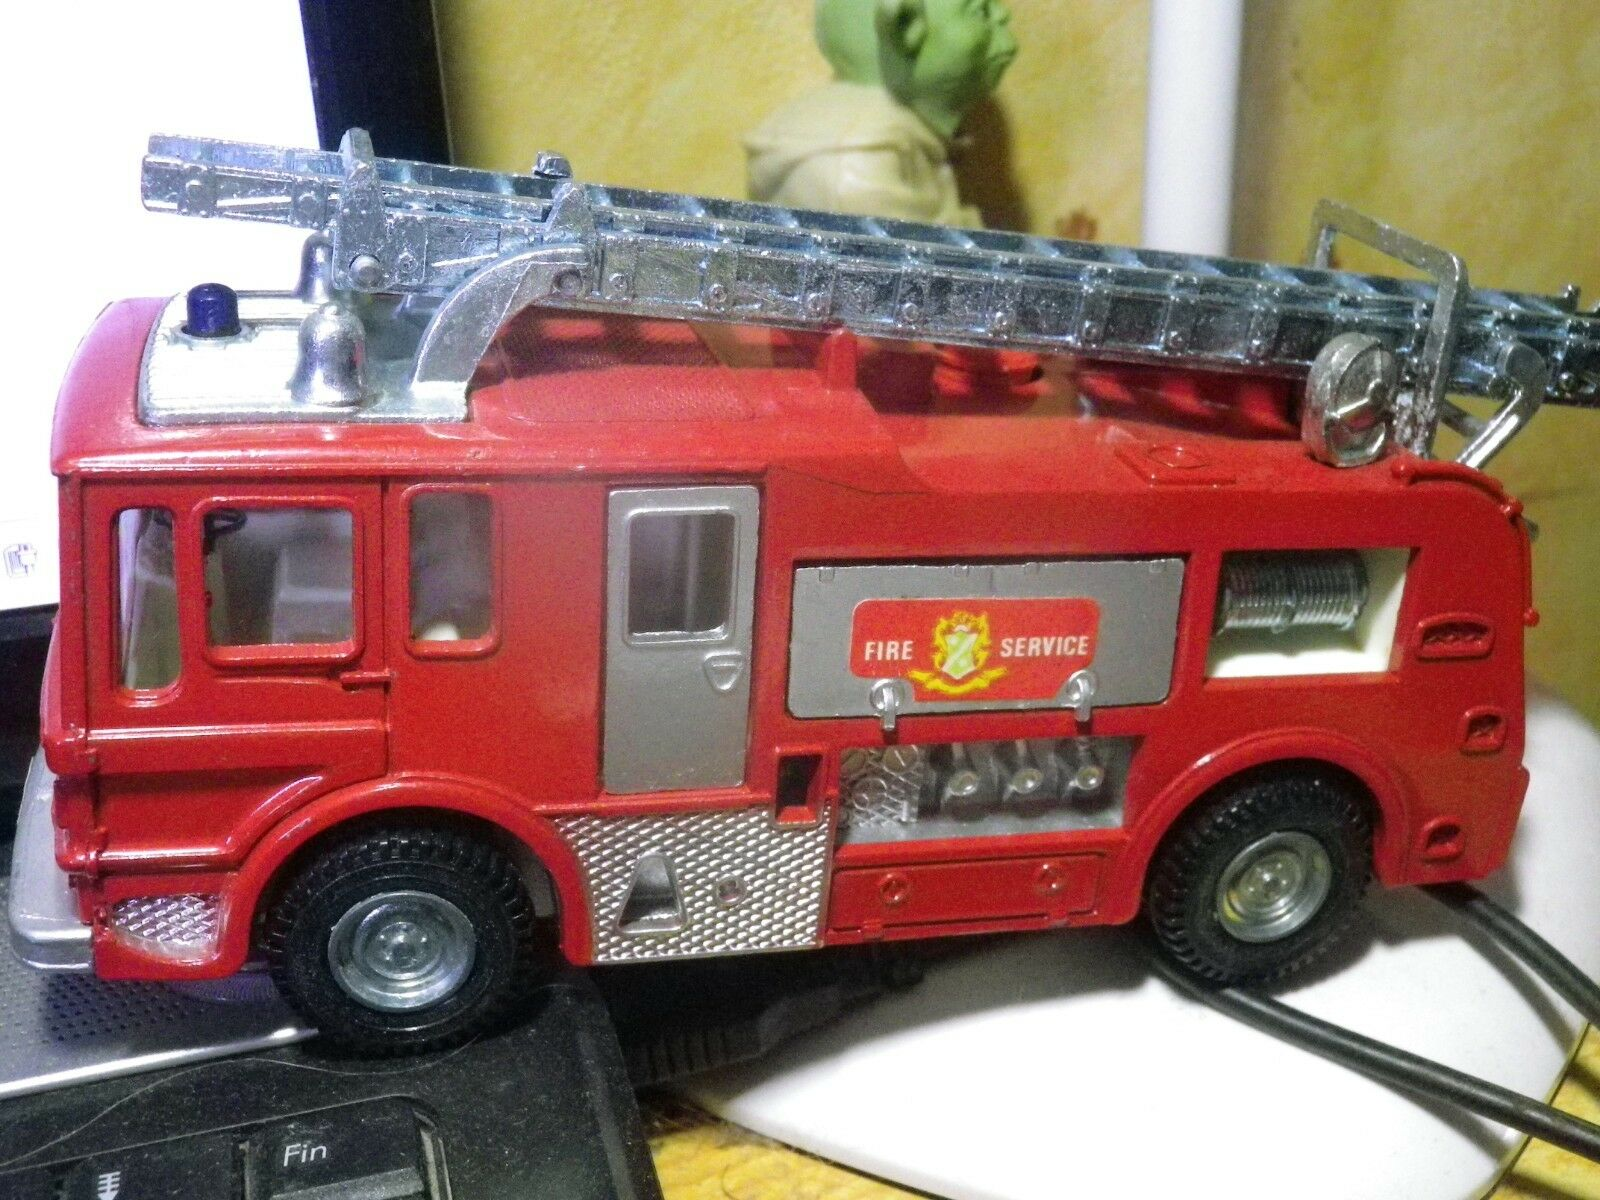 DINKY DINKY DINKY 259 FIRE ENGINE POMPIER, ROUES PLASTIQUE red, COMME NEUF EN BOITE 8ee046